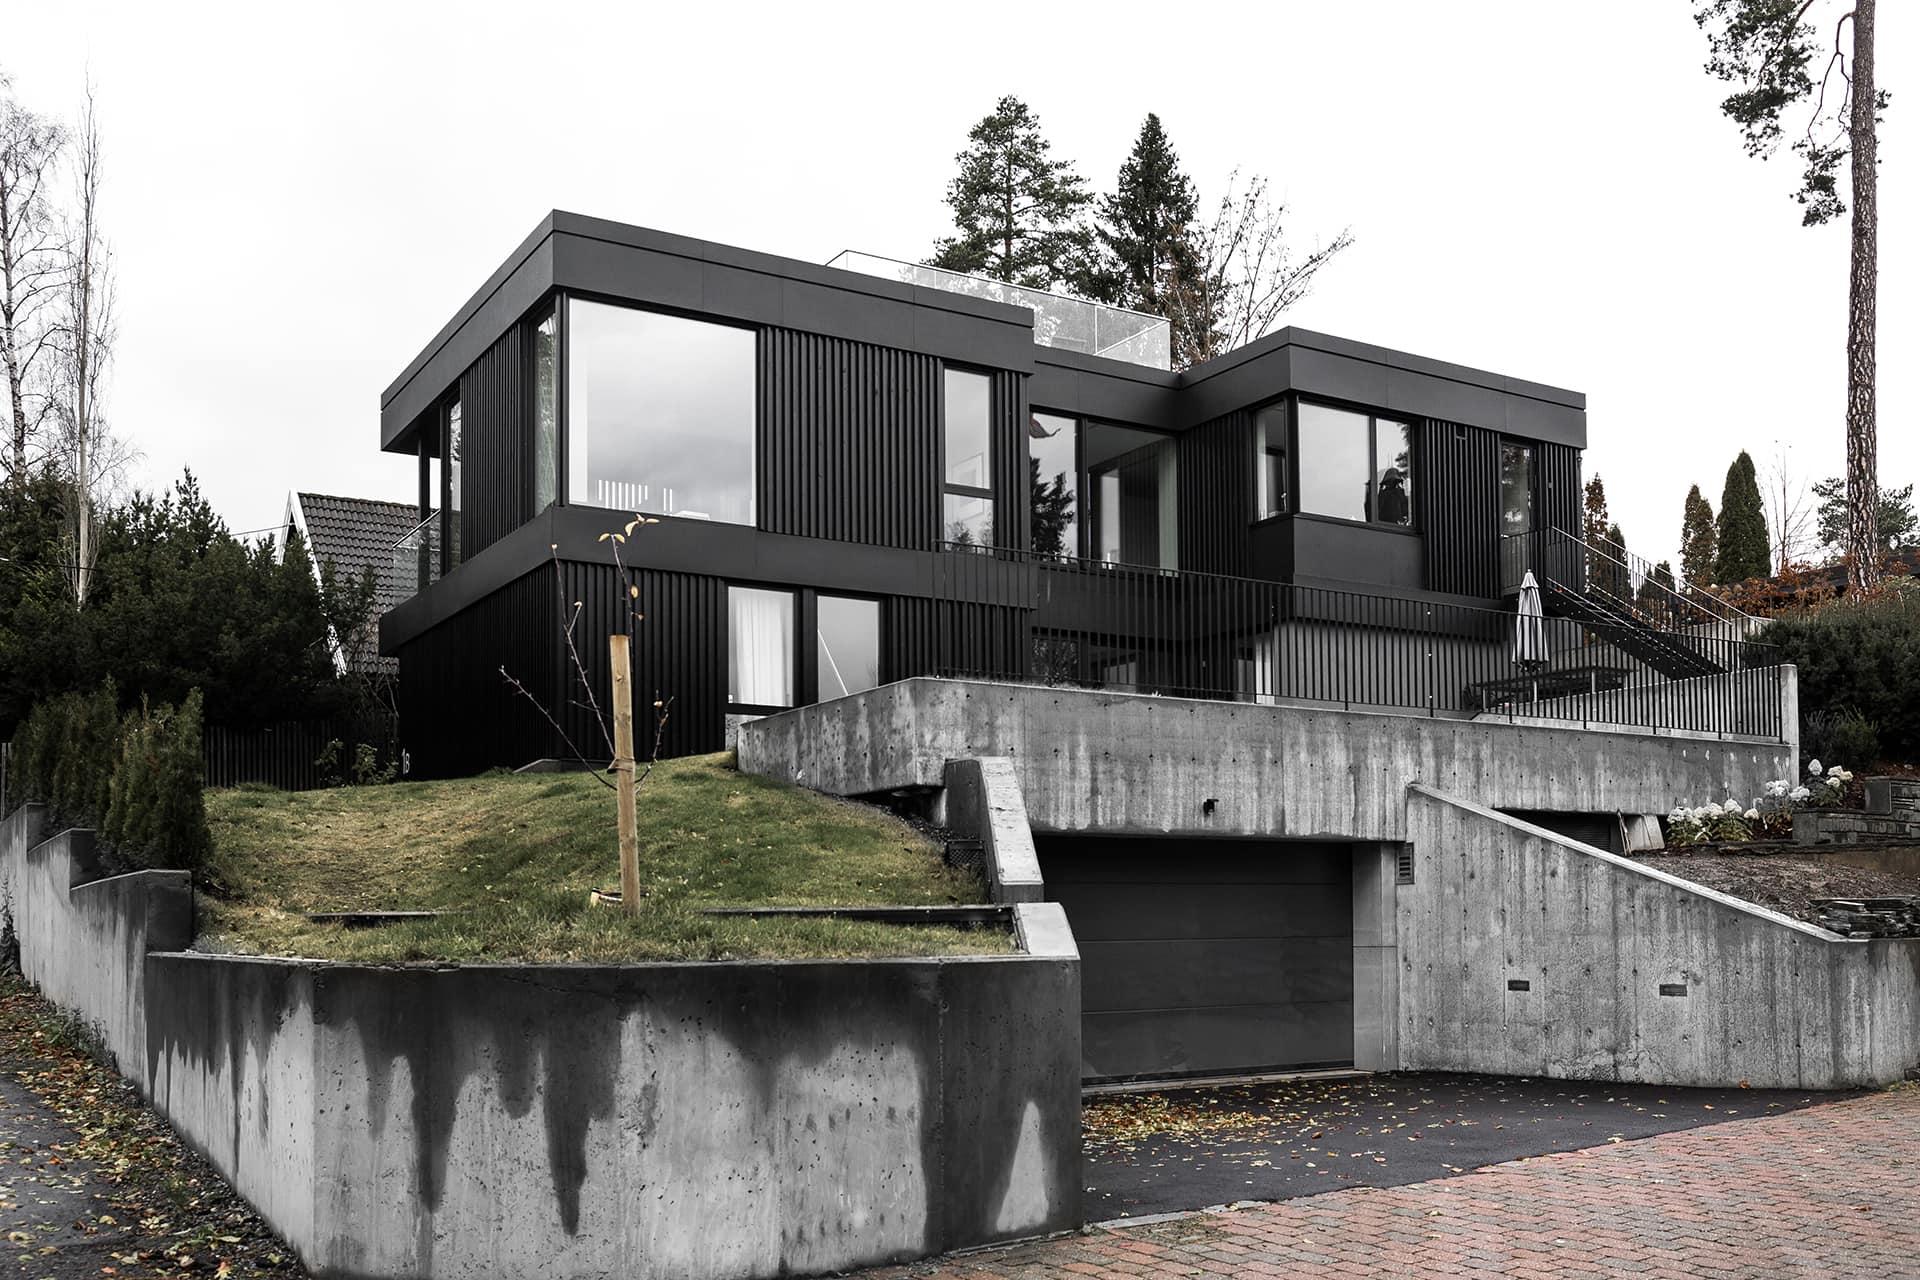 Ris, Oslo, bolig, Driv Arkitekter, foto av WISEWOOD